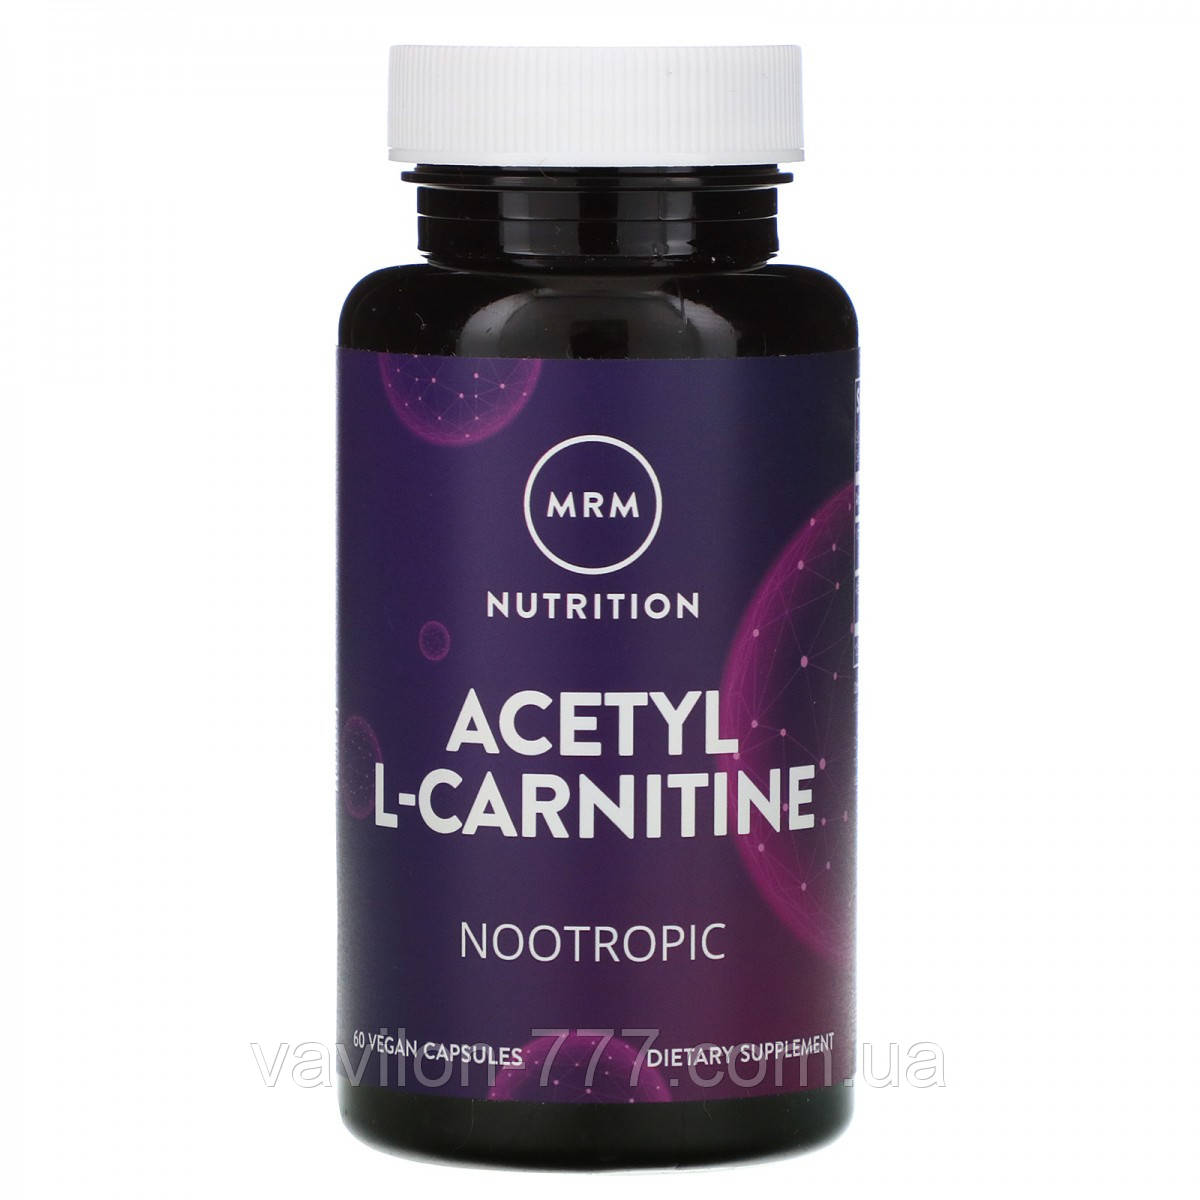 Ацетил-L-карнитин, 60  капсул. MRM, Nutrition